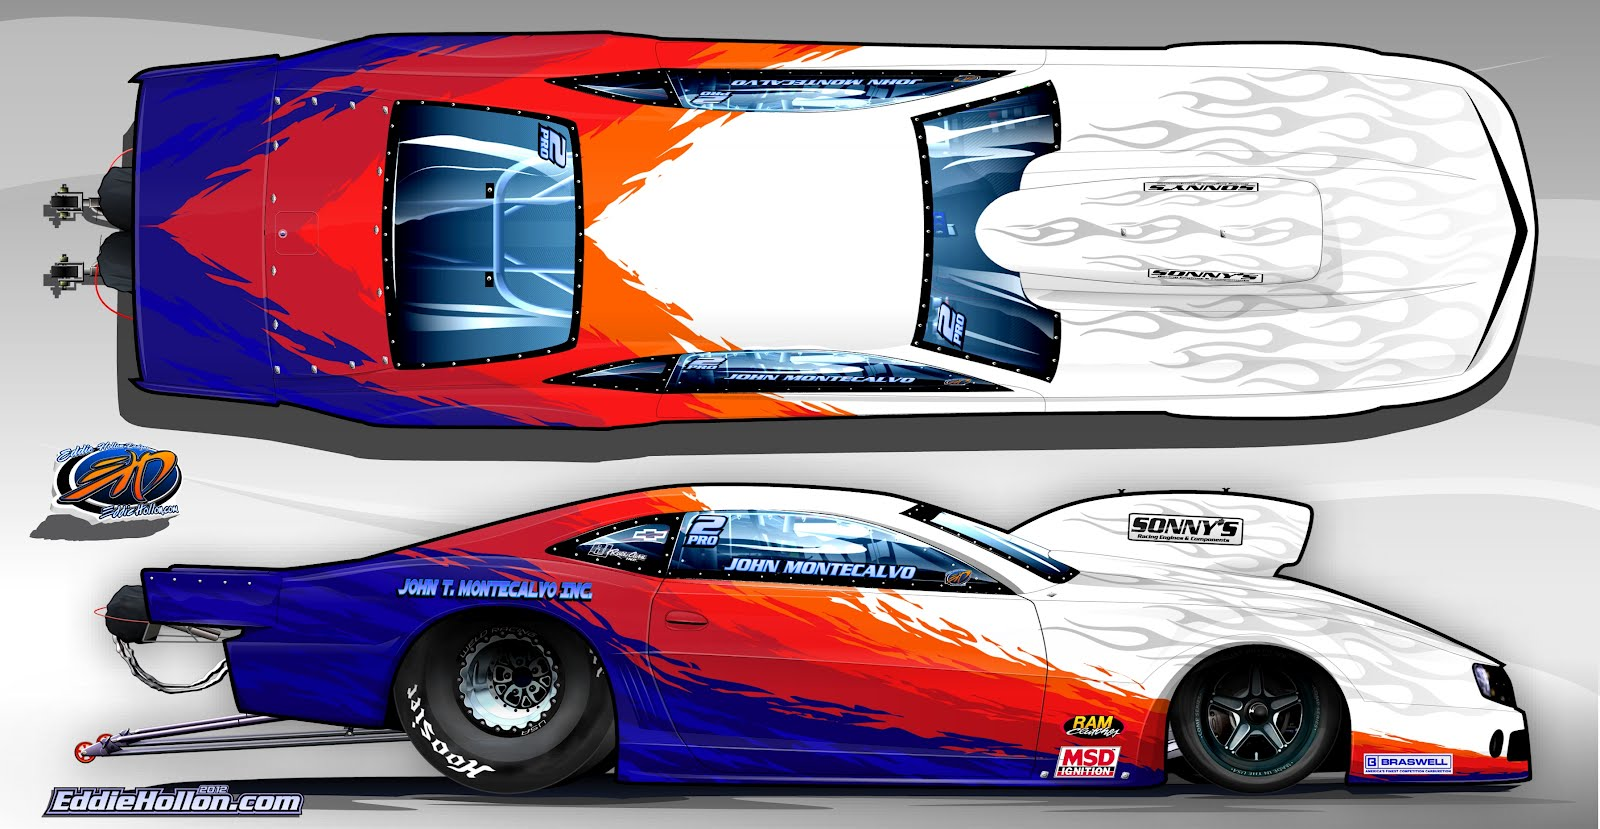 Pro Stock Camaro Race Car Paint Schemes on Chevrolet Engine Scheme